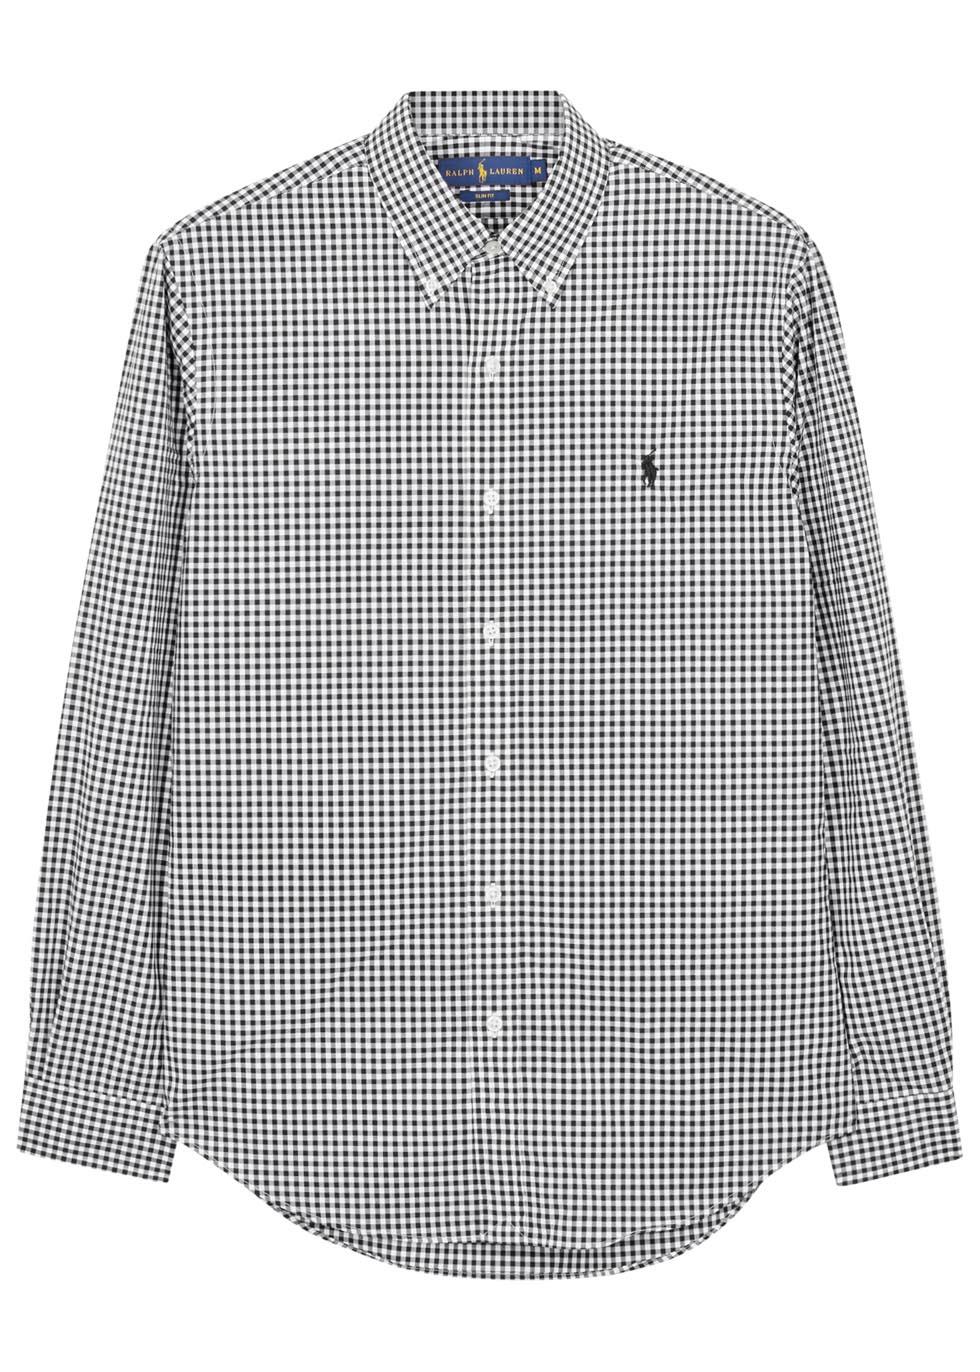 Lyst polo ralph lauren monochrome slim checked cotton for Black and white check mens shirt